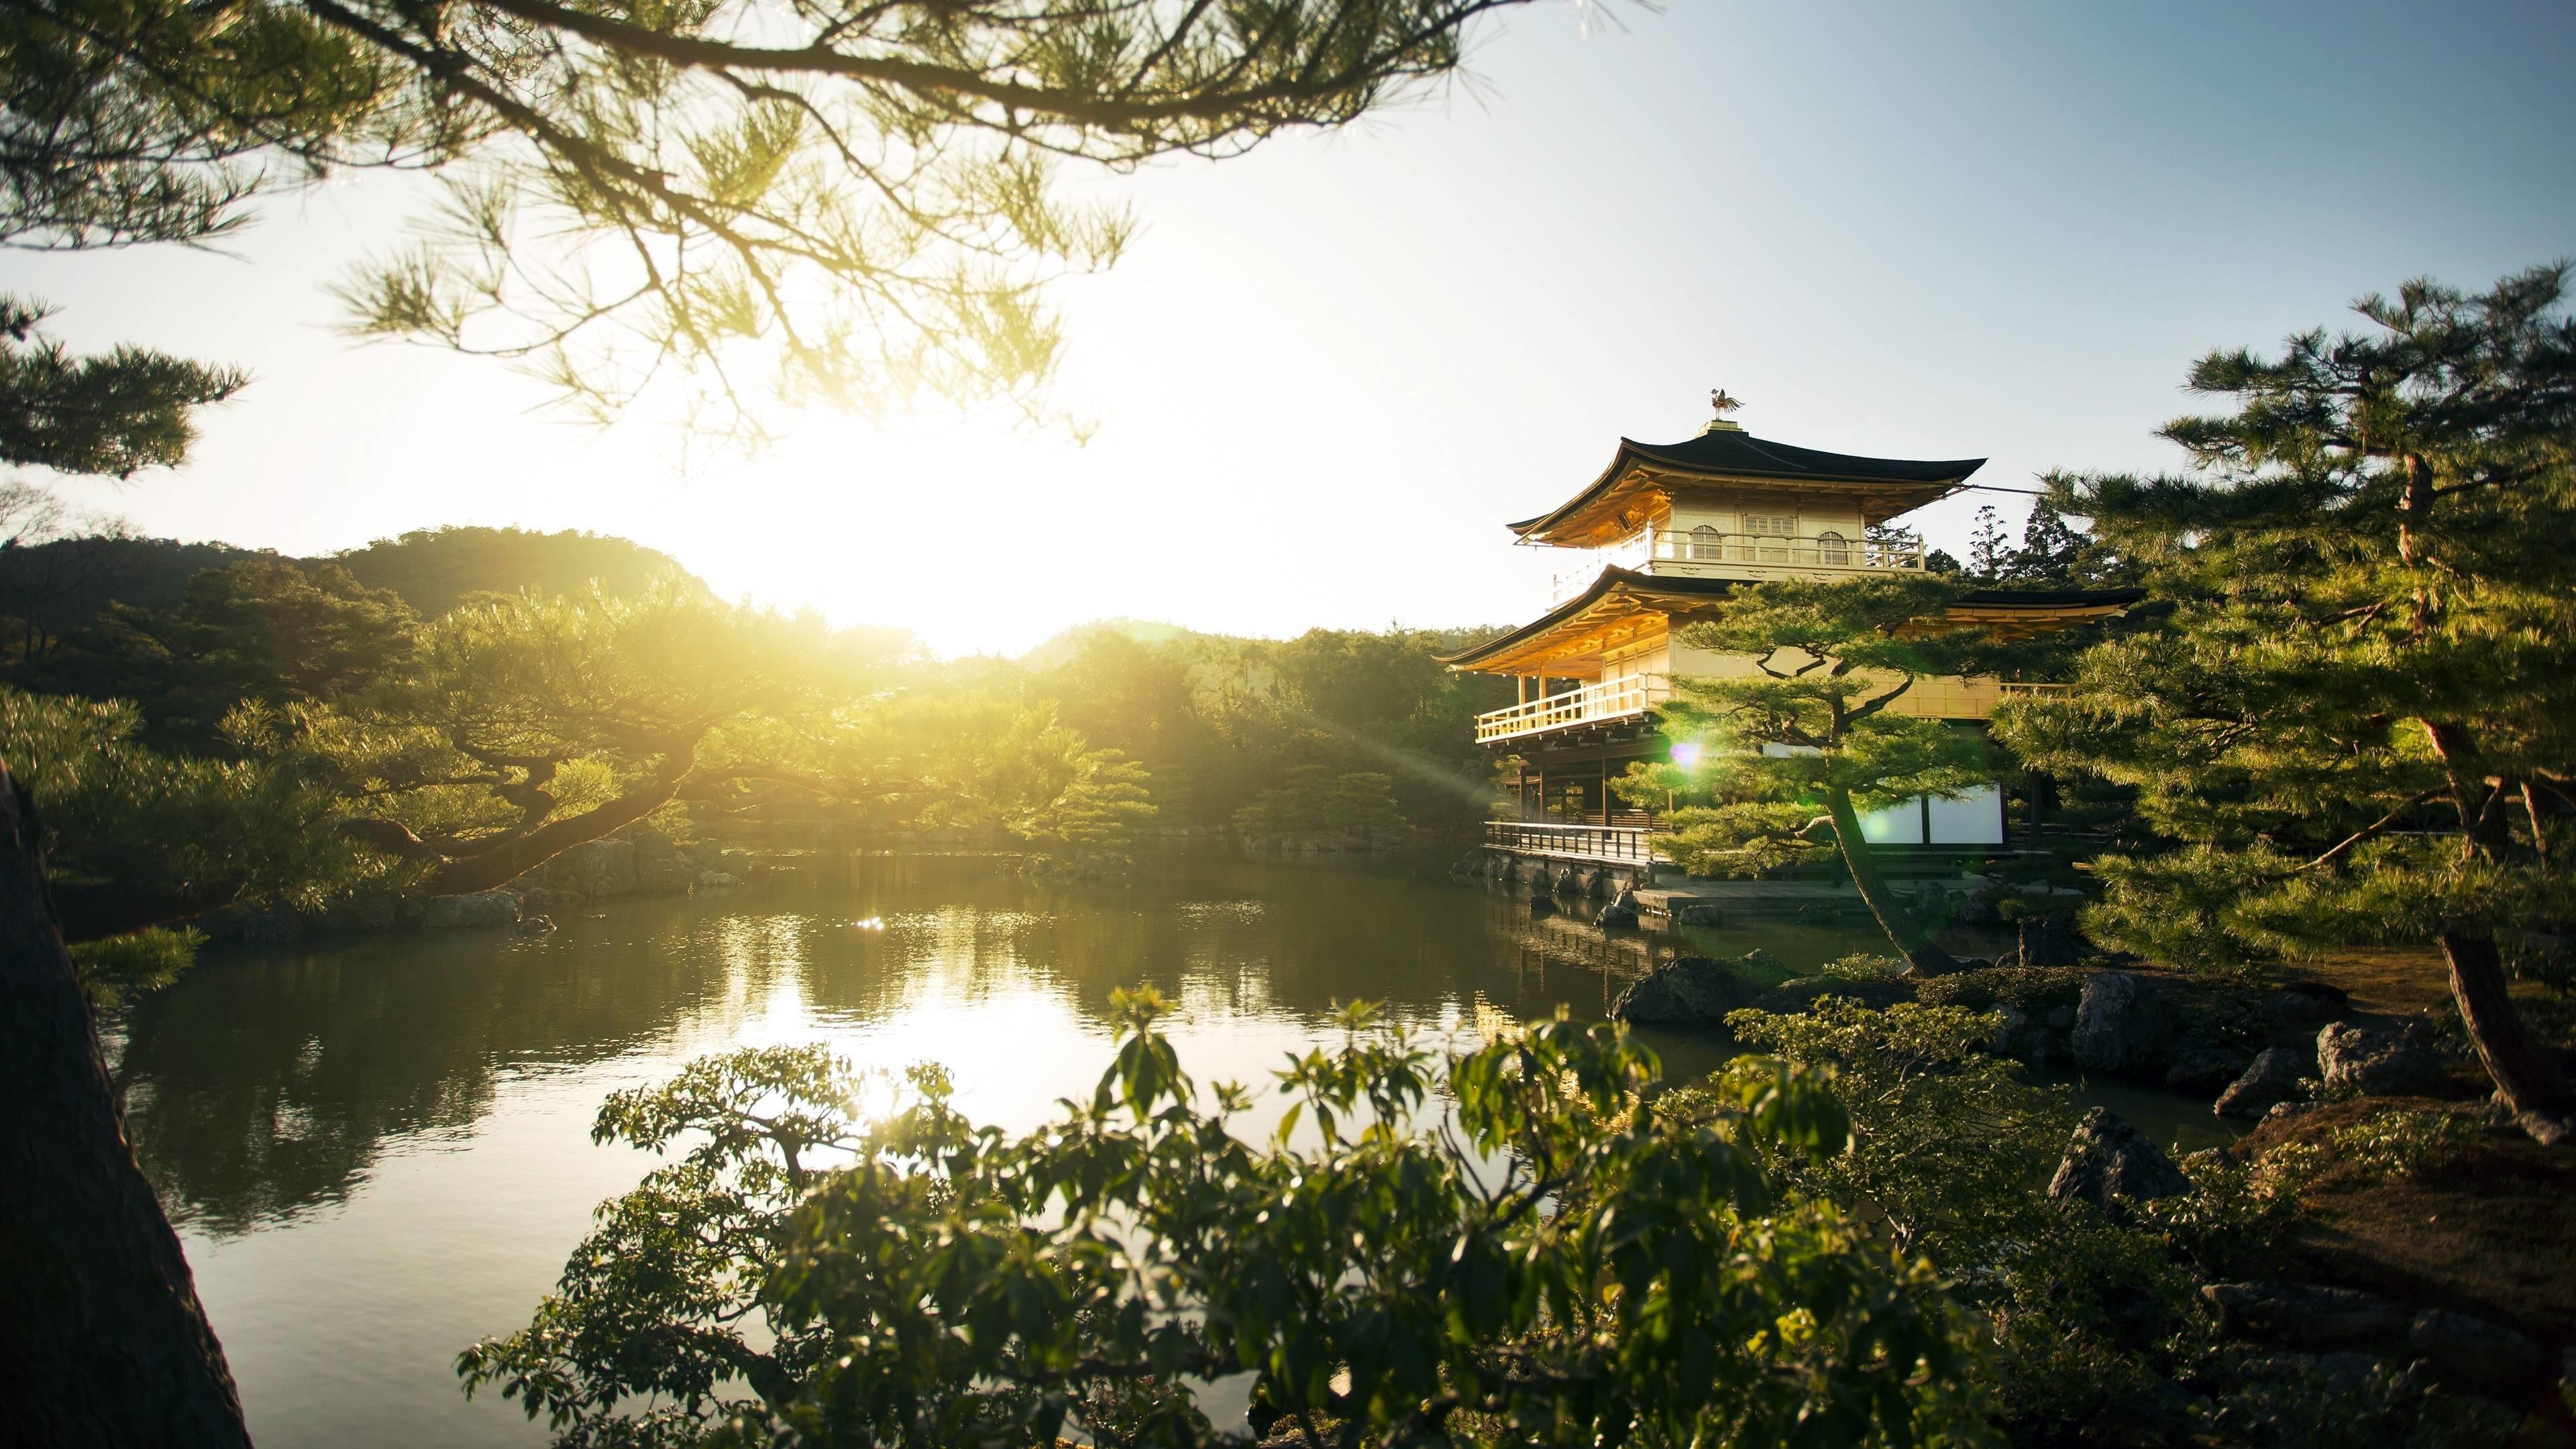 Res: 3840x2160,  japanese-style-house-hd-desktop-wallpaper Japan wallpaper HD free